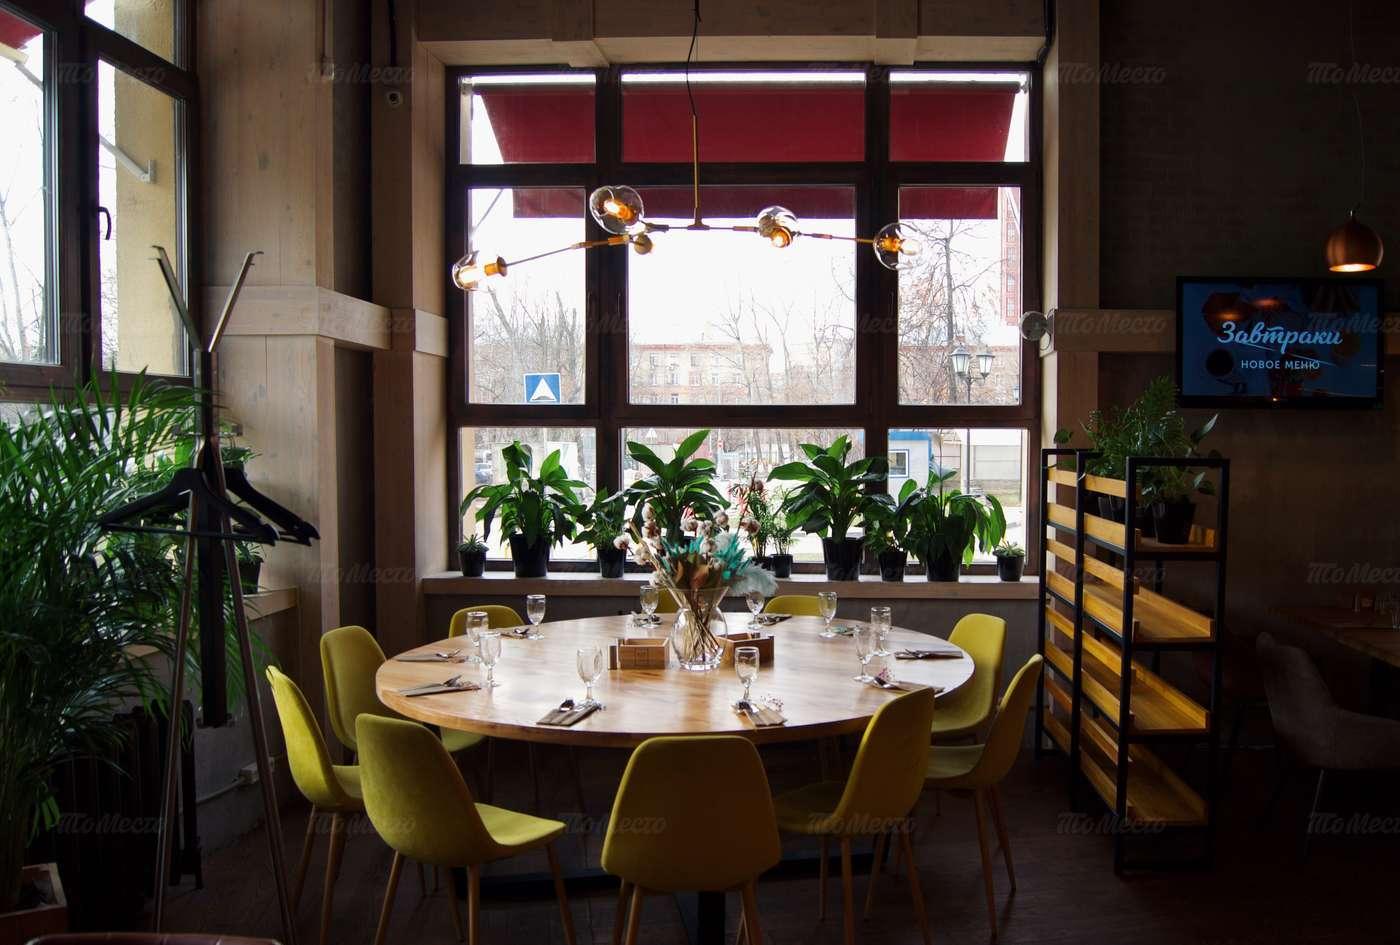 Ресторан Kvartal Daily Bistro. Москва ул. Маршала Рыбалко, д. 2/8